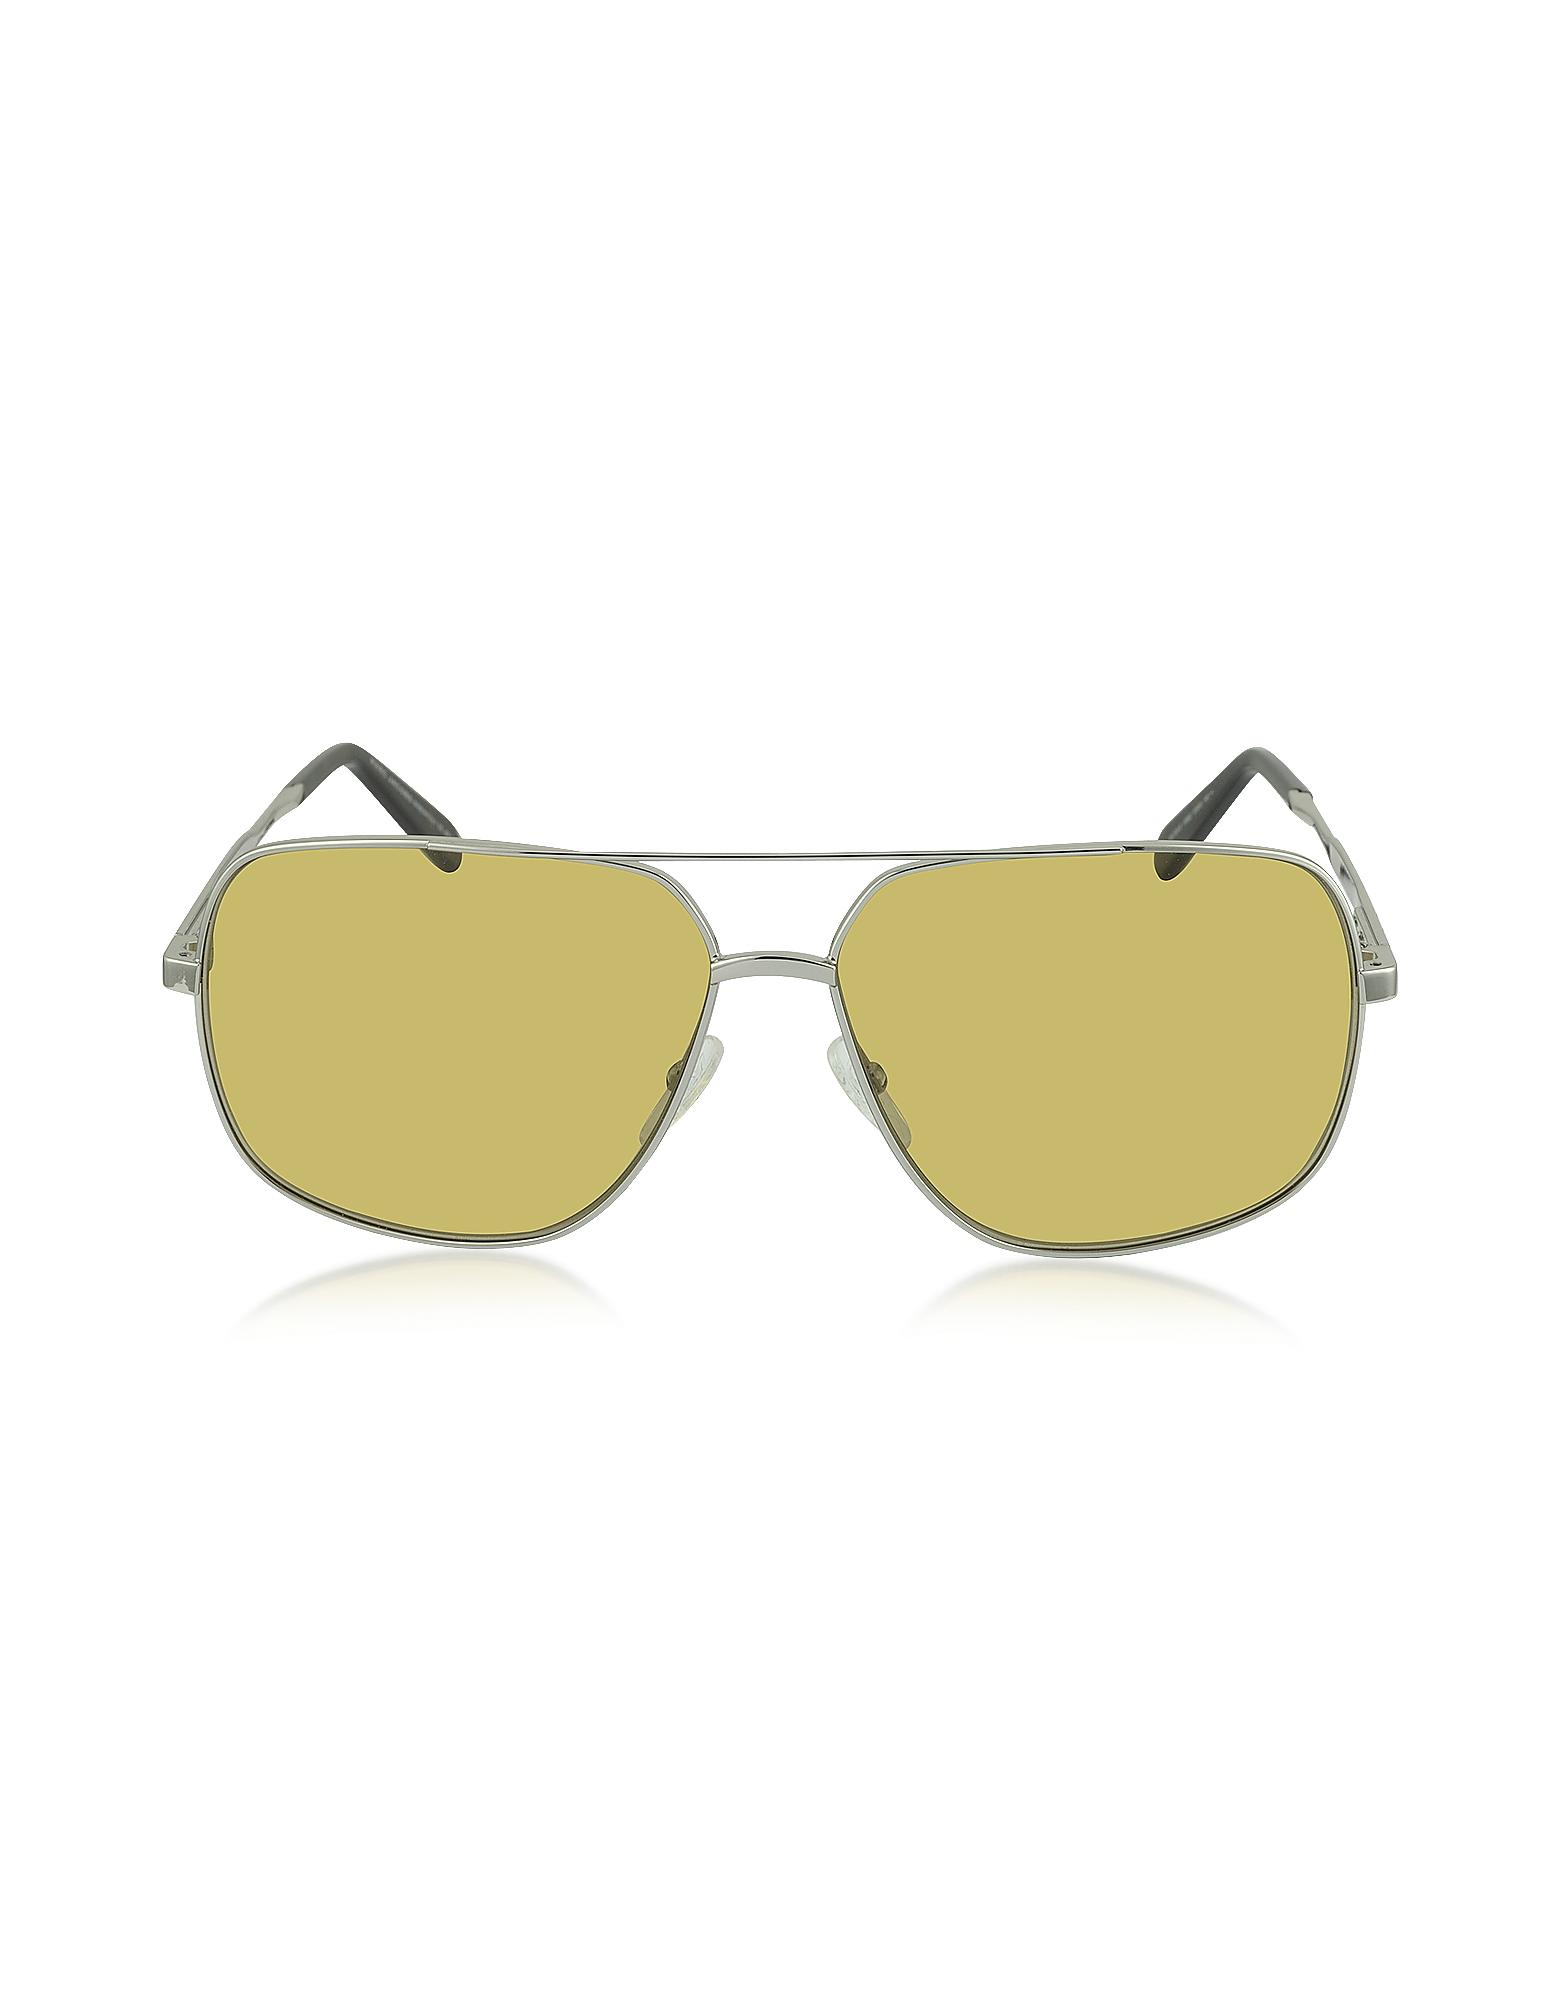 Marc Jacobs Sunglasses, MJ 594/S Metal Aviator Sunglasses